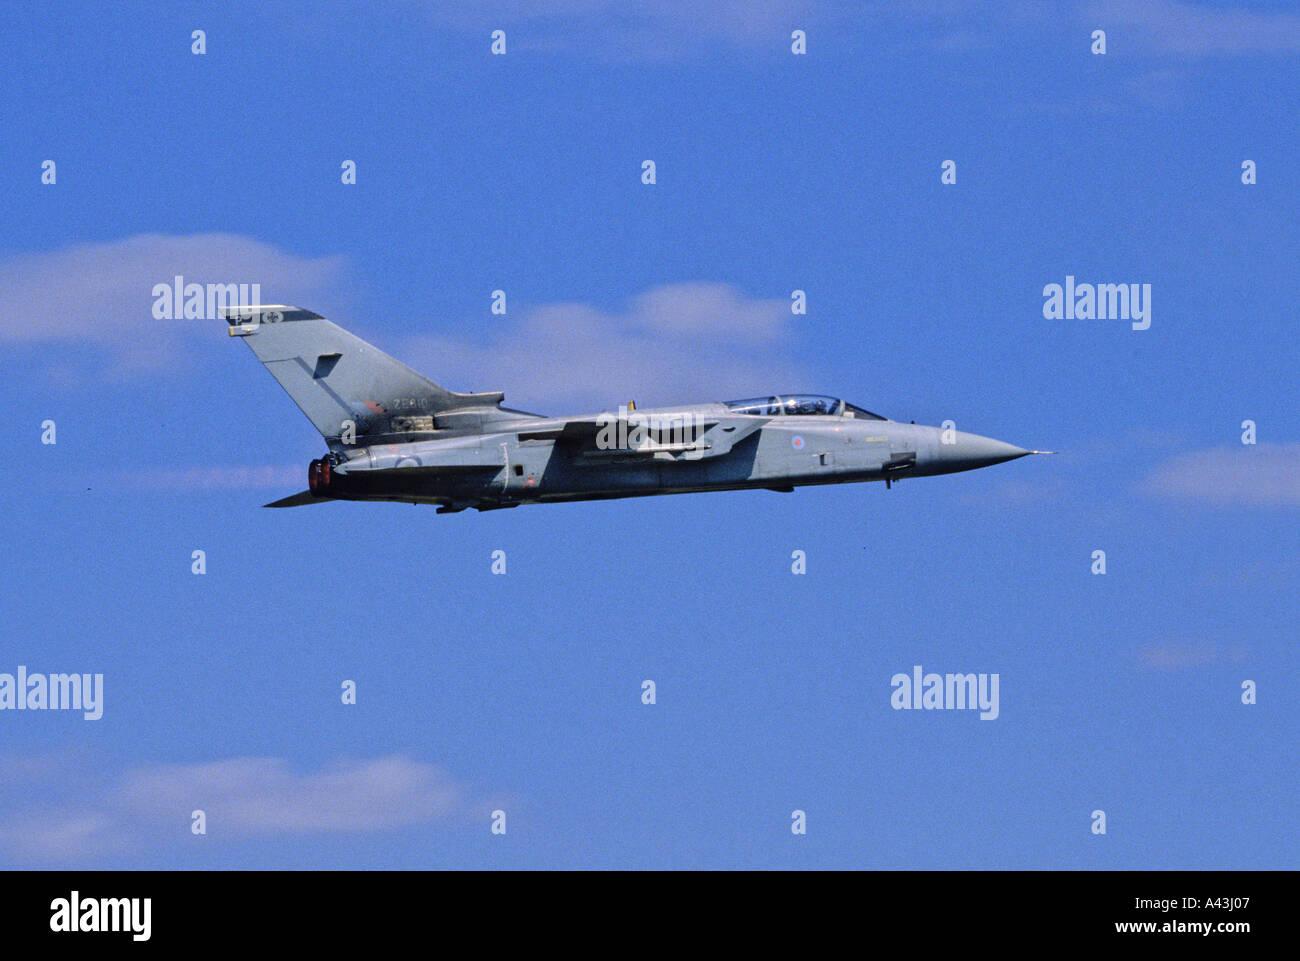 RAF Tornado F3 fighter aircraft - Stock Image